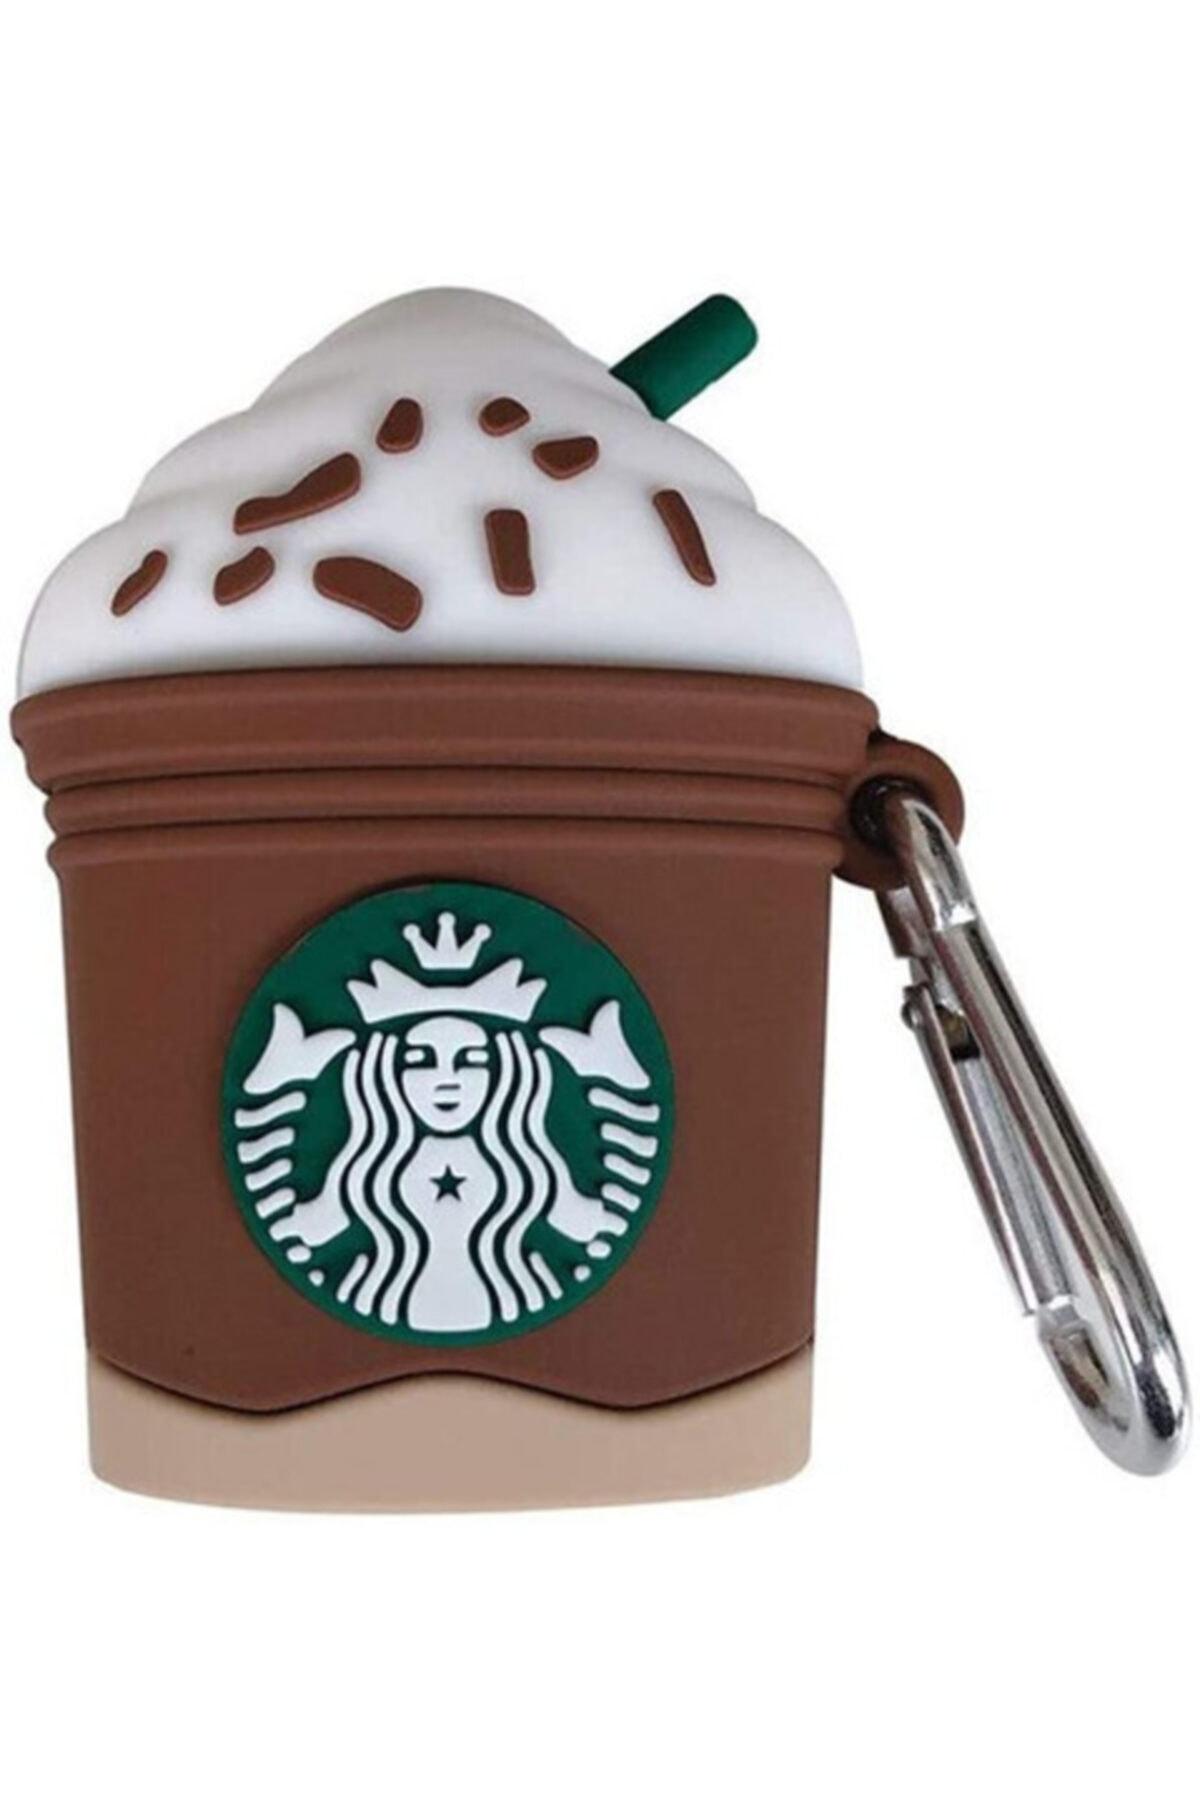 MY MÜRDÜM Sevimli Starbucks Kahverengi Airpods Kılıfı 1. Ve 2. Nesil Uyumlu 2